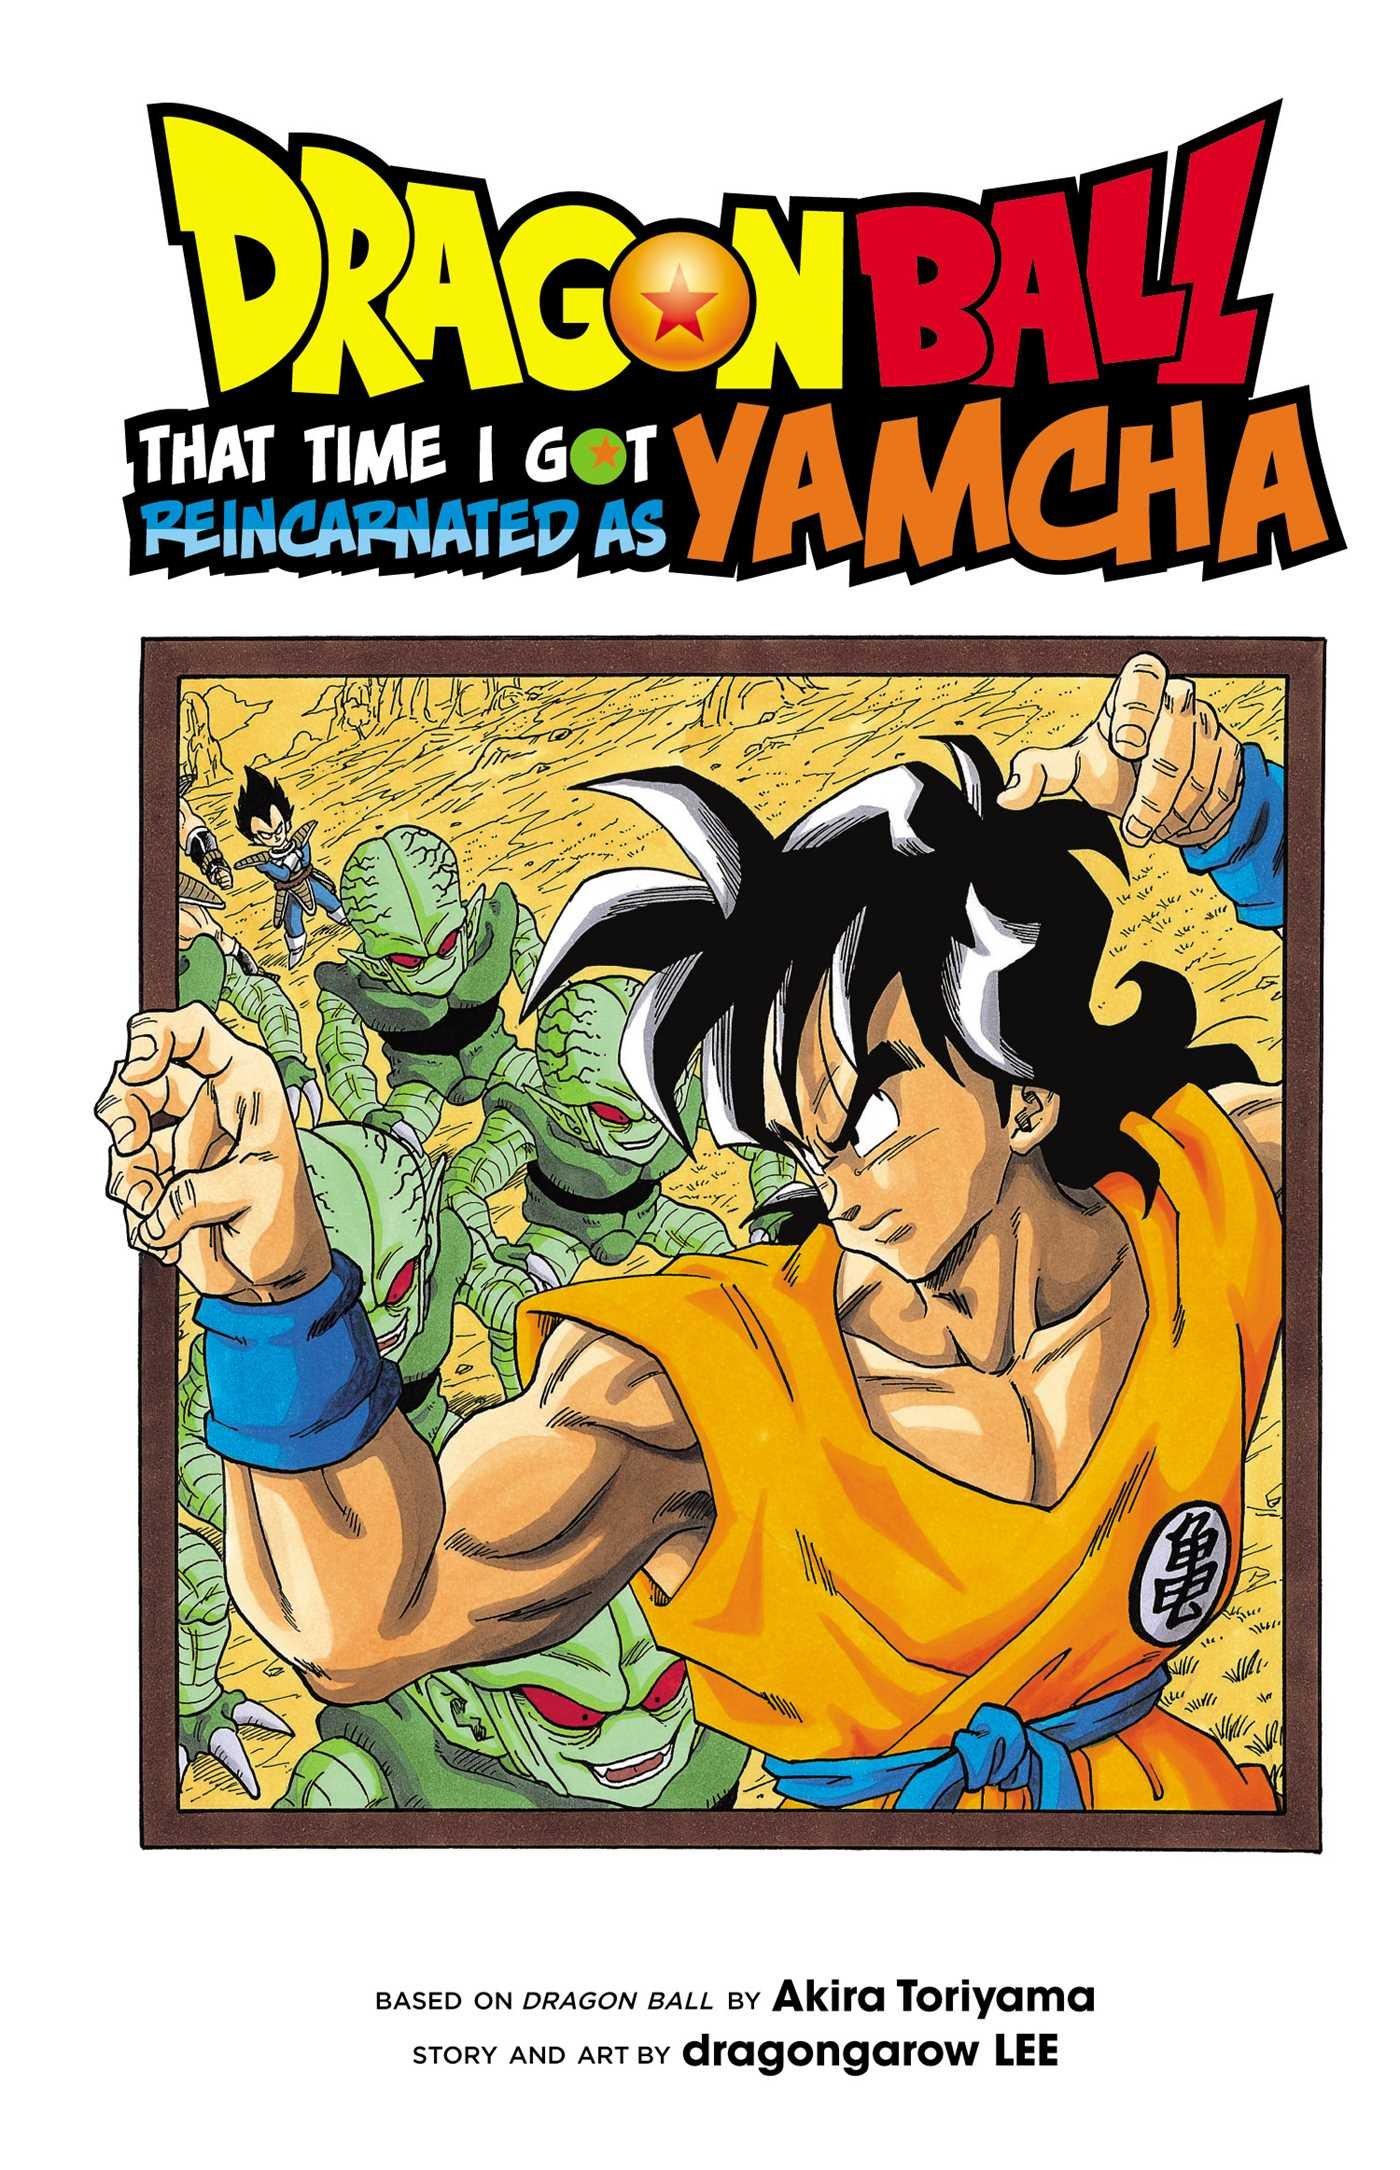 Dragon Ball That Time I Got Reincarnated As Yamcha Akira Toriyama